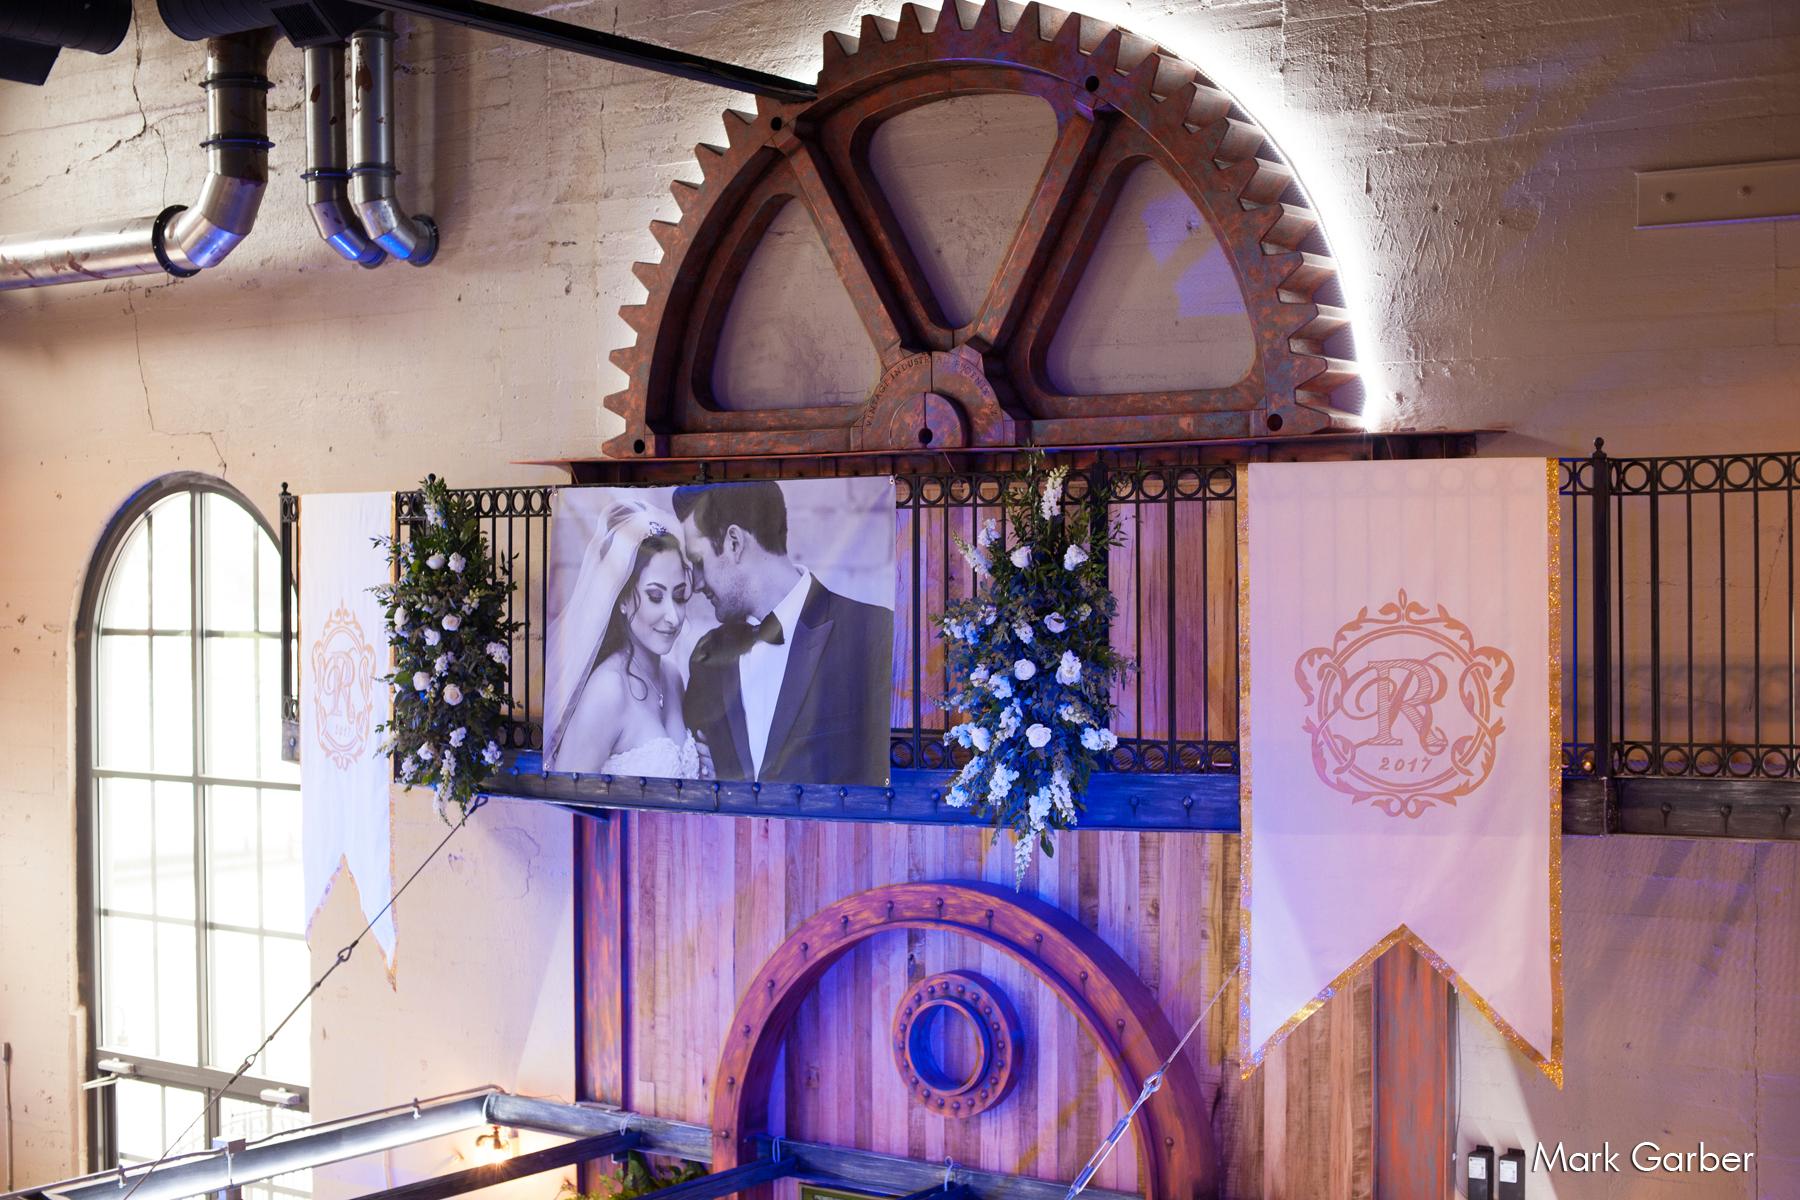 steam-plant-dayton-wedding-event-venue-elite-catering-mark-garber_005.jpg